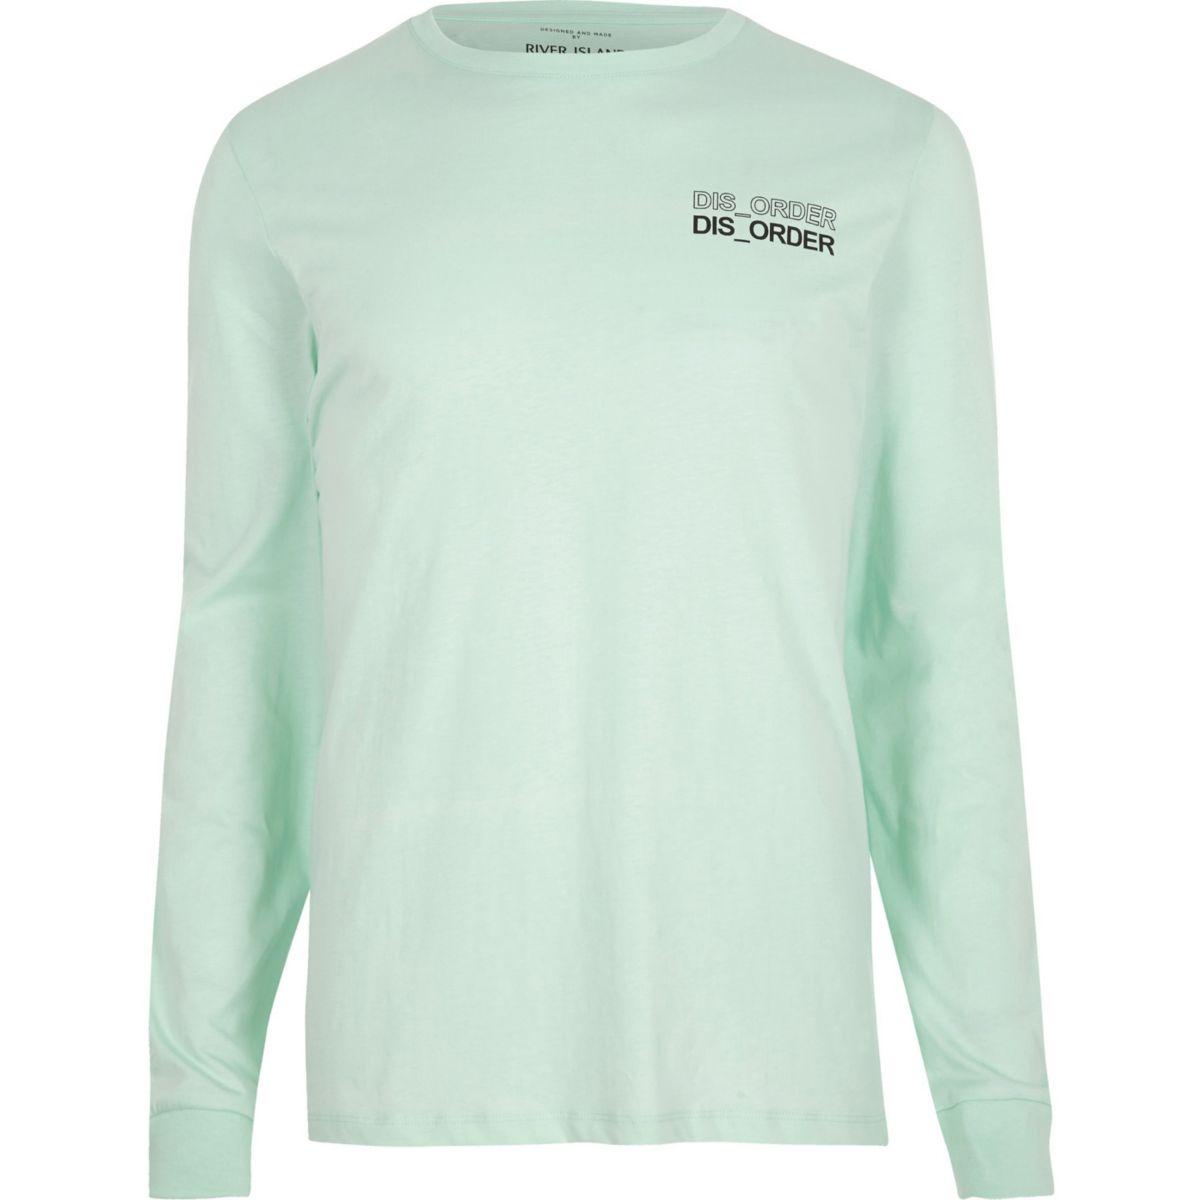 Green 'disorder' print long sleeve T-shirt